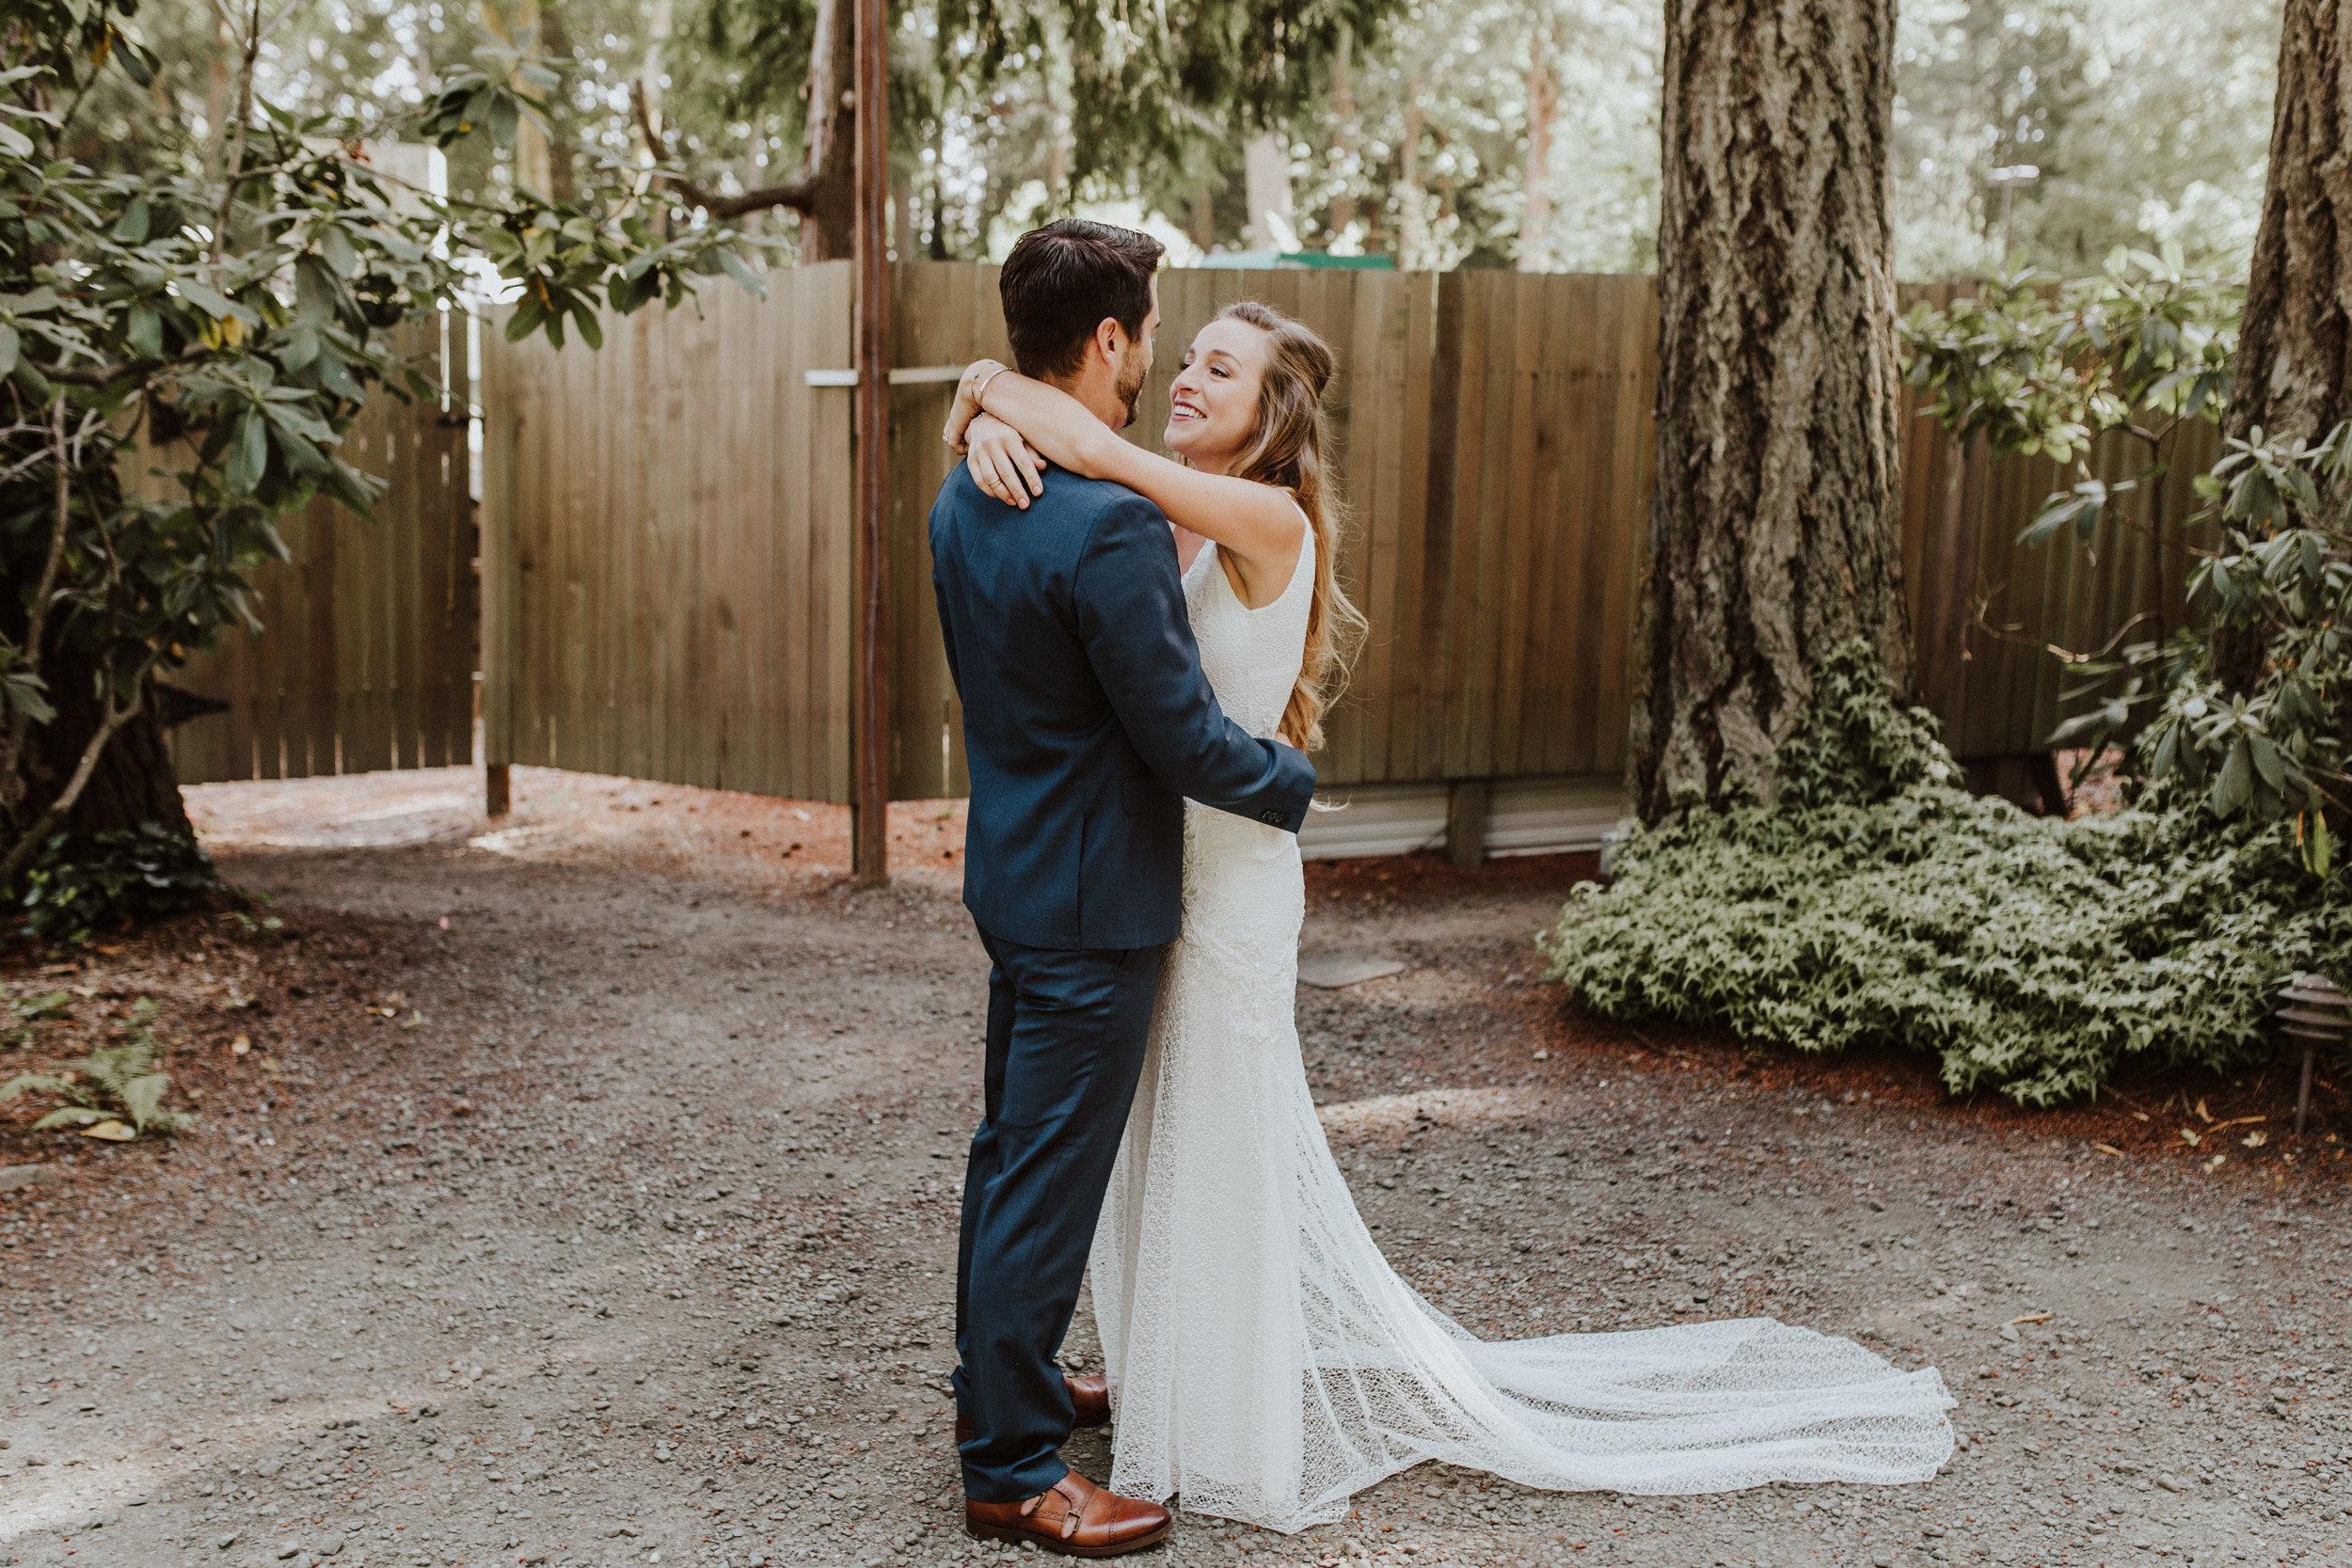 wedding photographer washington seattle first look